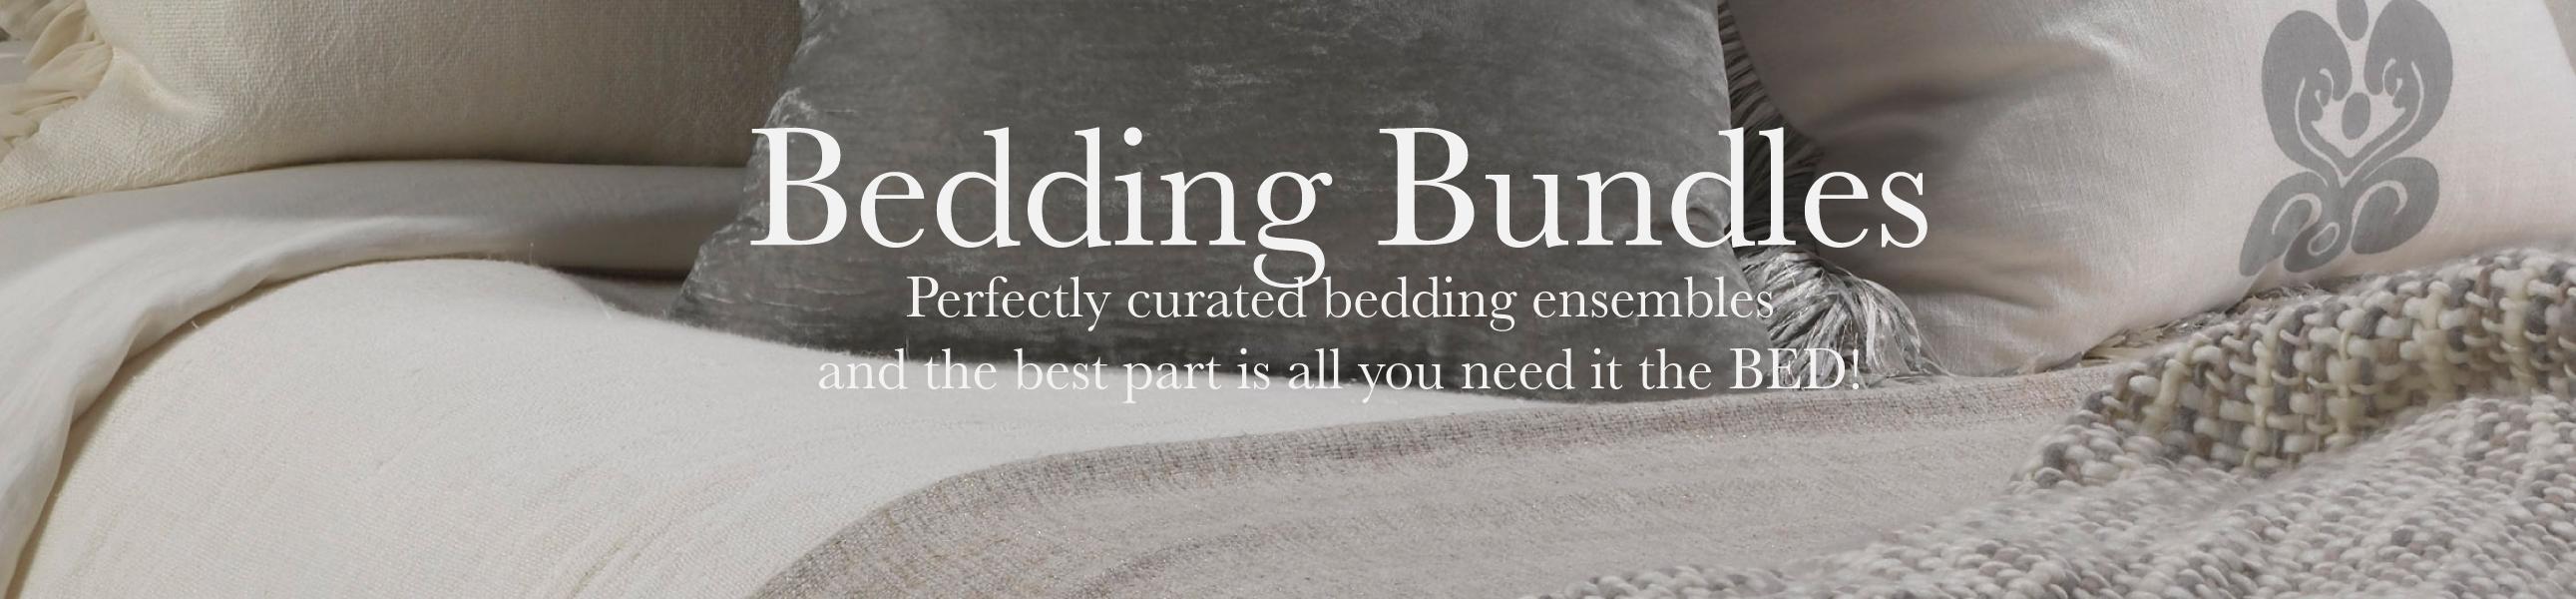 cd-bedding-bundles.jpg